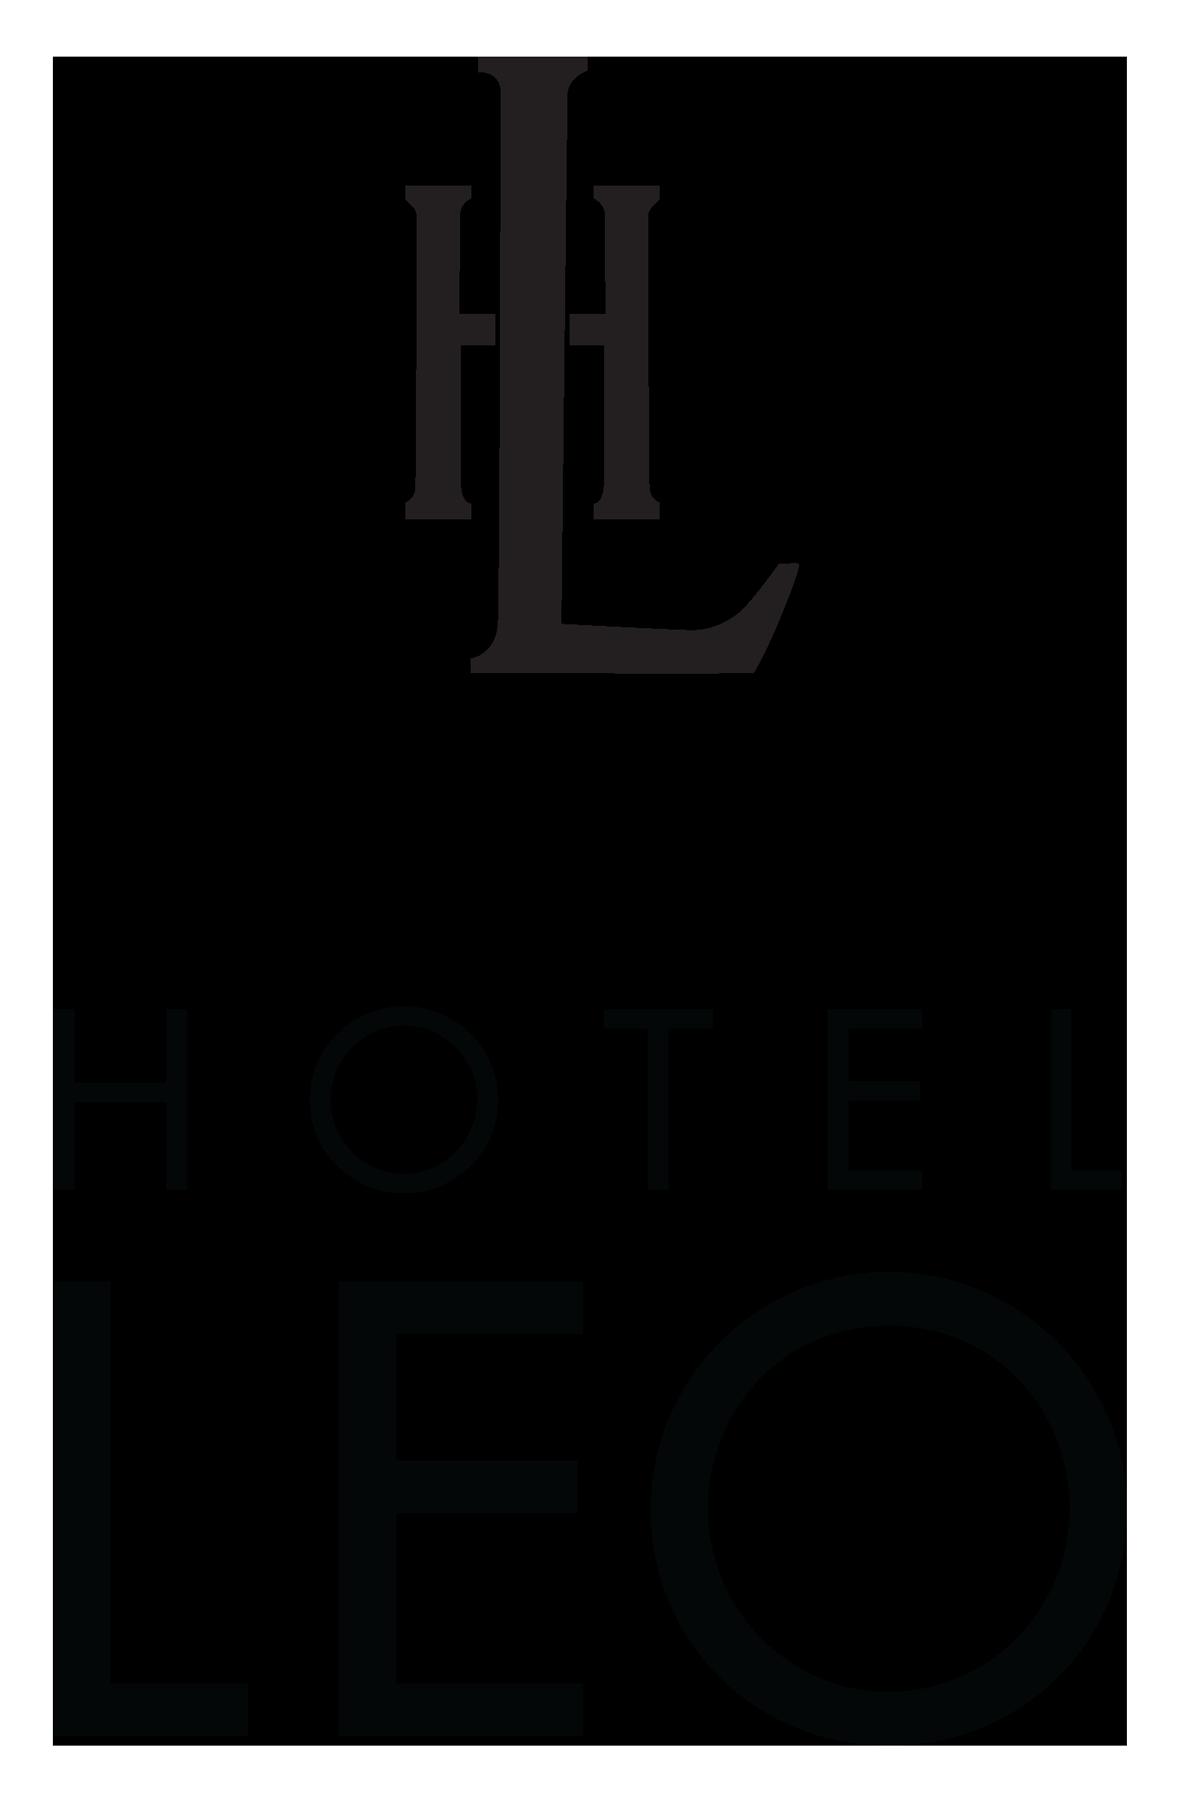 Hotel Leo logo